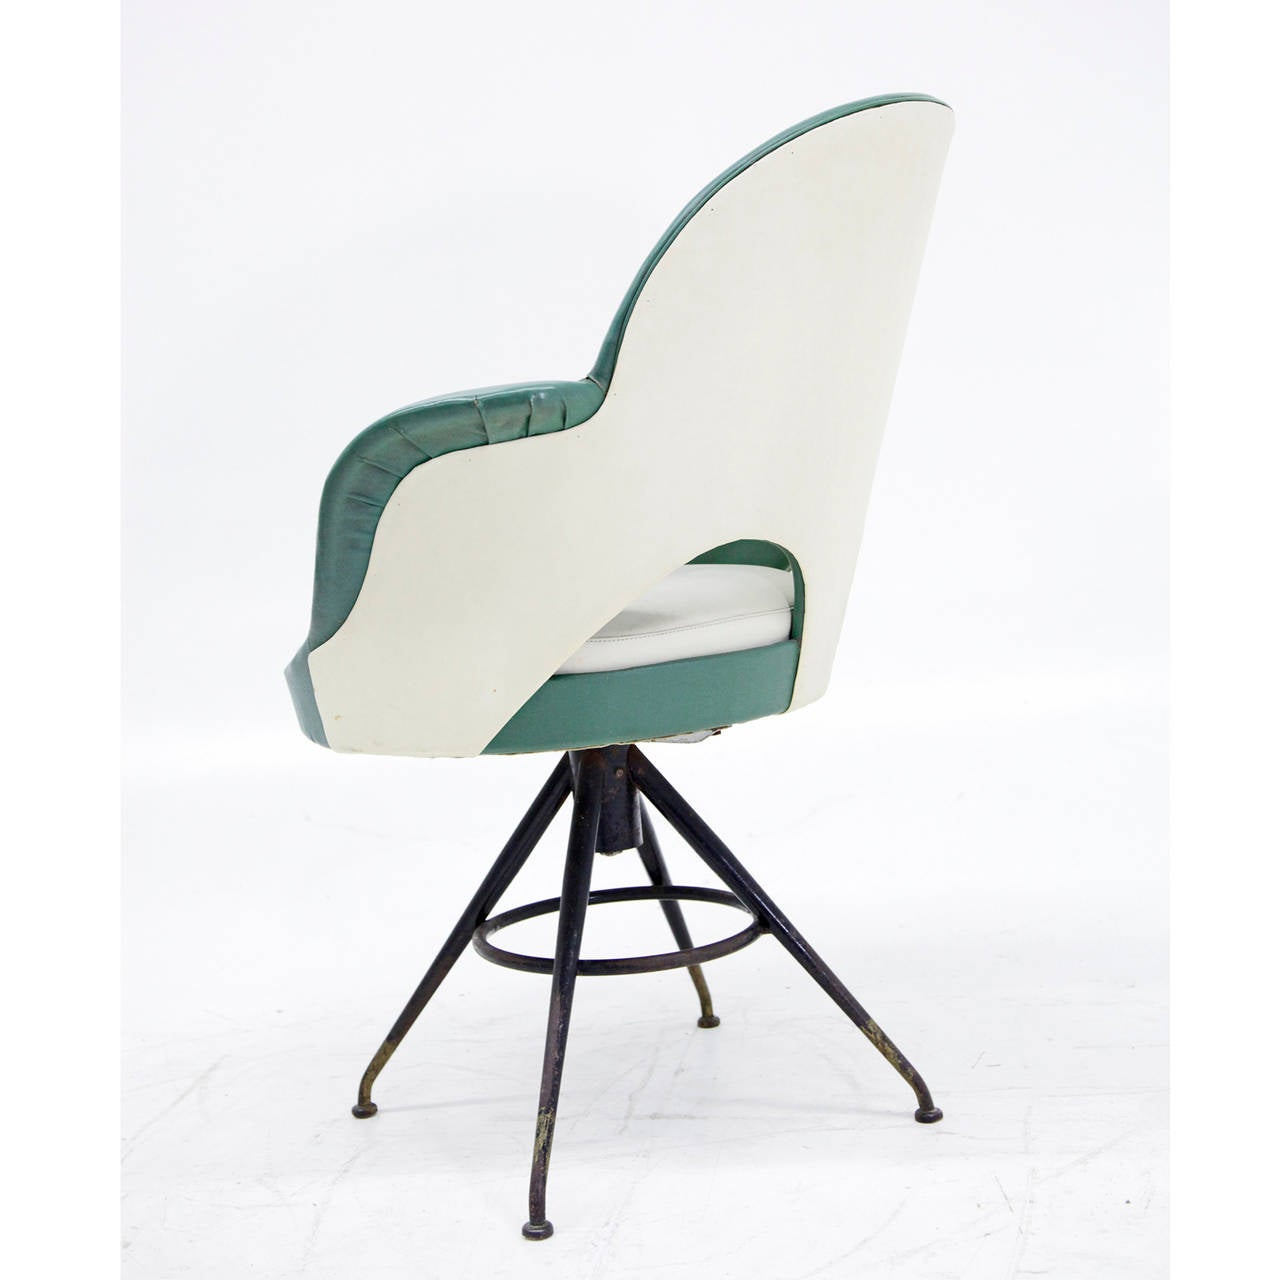 revolving chair dealers in chennai koala fishing very nice pair of italian armchairs or chairs